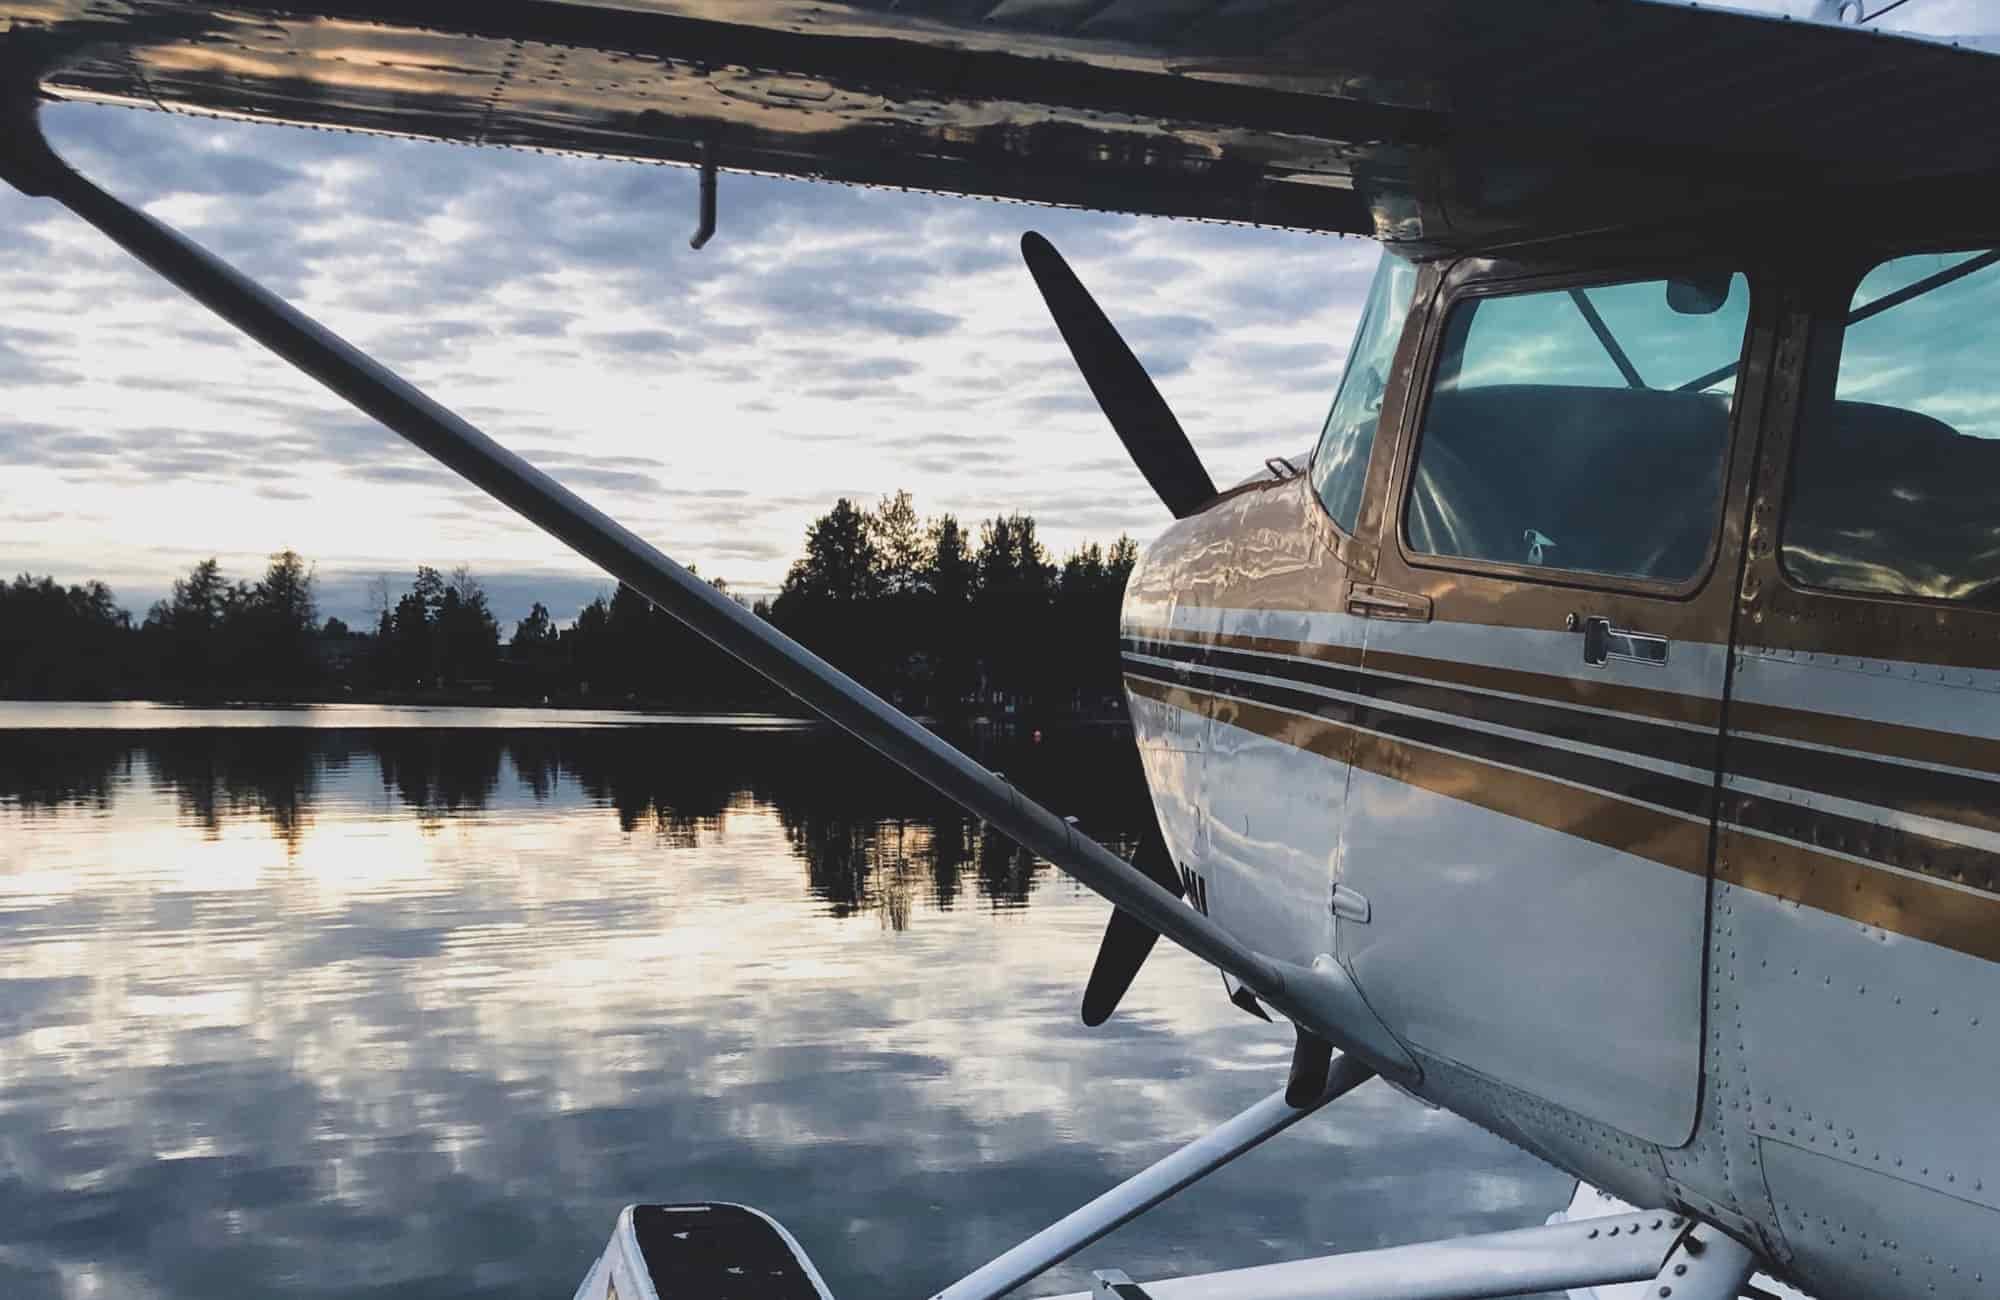 Voyage Etats-Unis Alaska - Hydravion Anchorage lac Spenard - Amplitudes